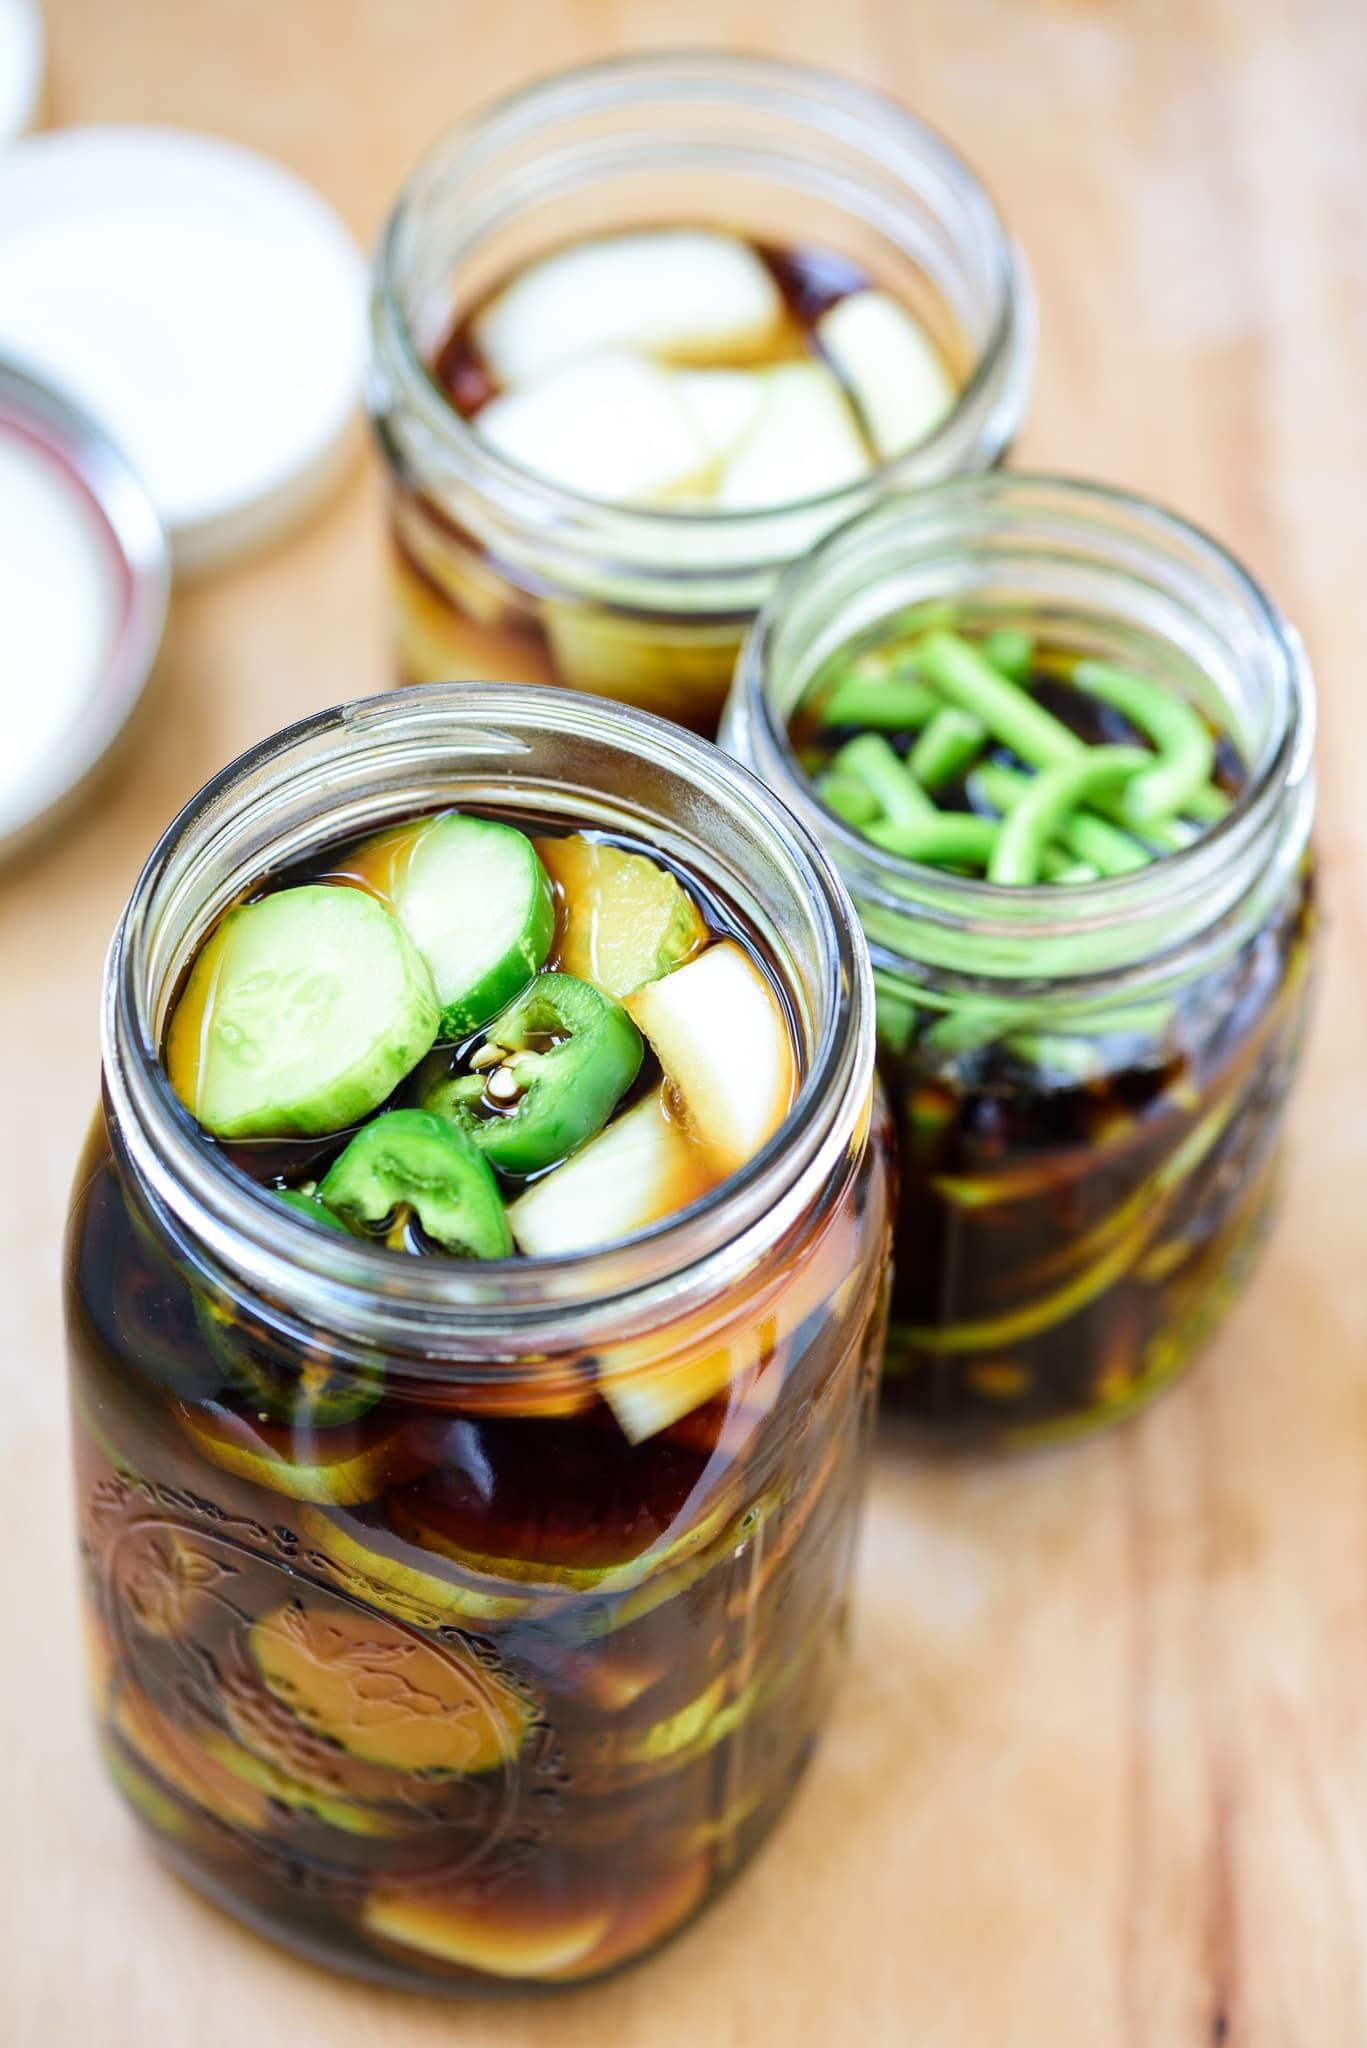 Korean pickle recipe